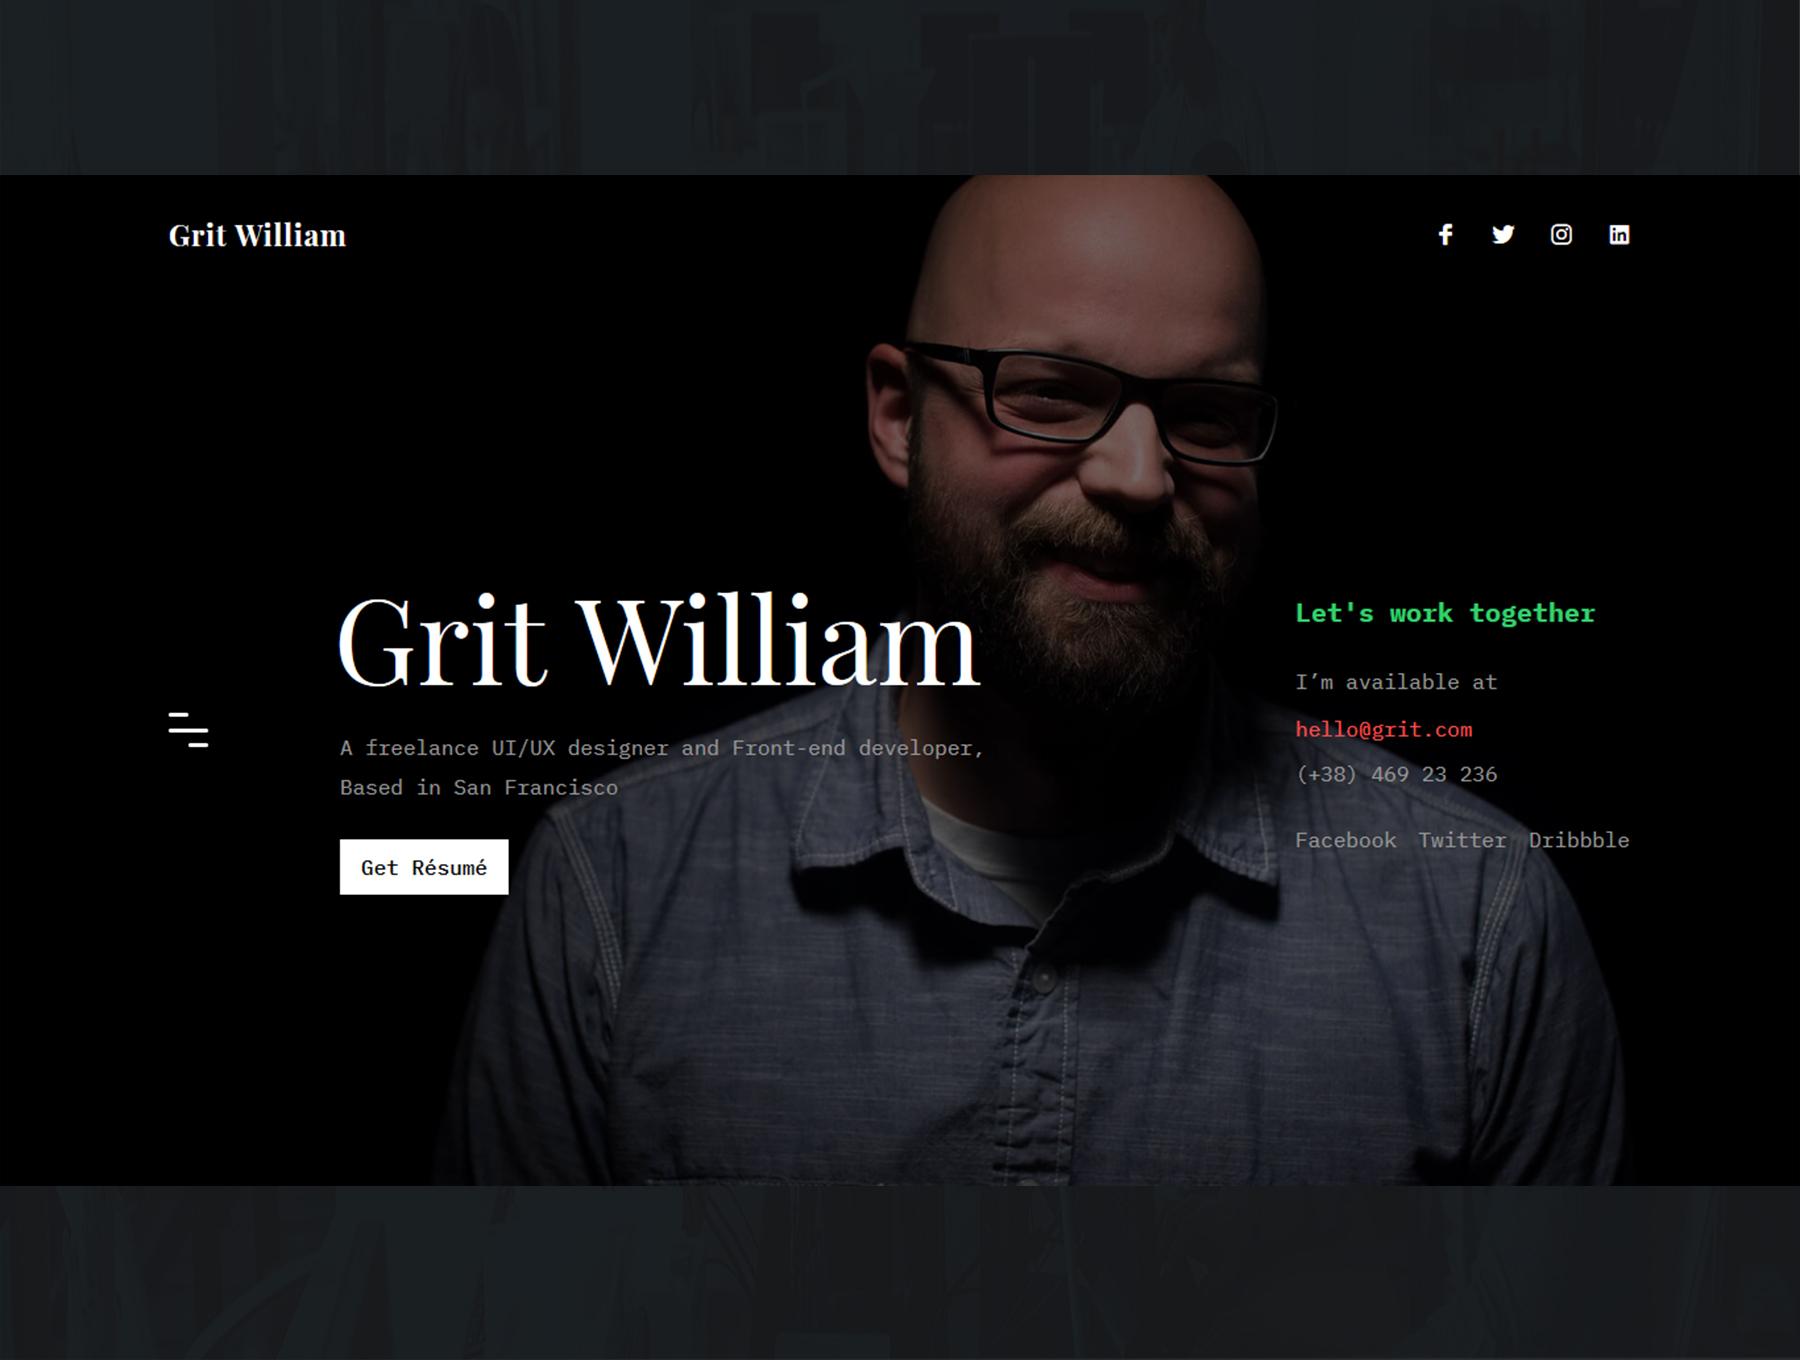 Grit Portfolio CV Resume HTML Template - دانلود قالب سایت Grit - قالب رزومه و نمونه کار شخصی وردپرس